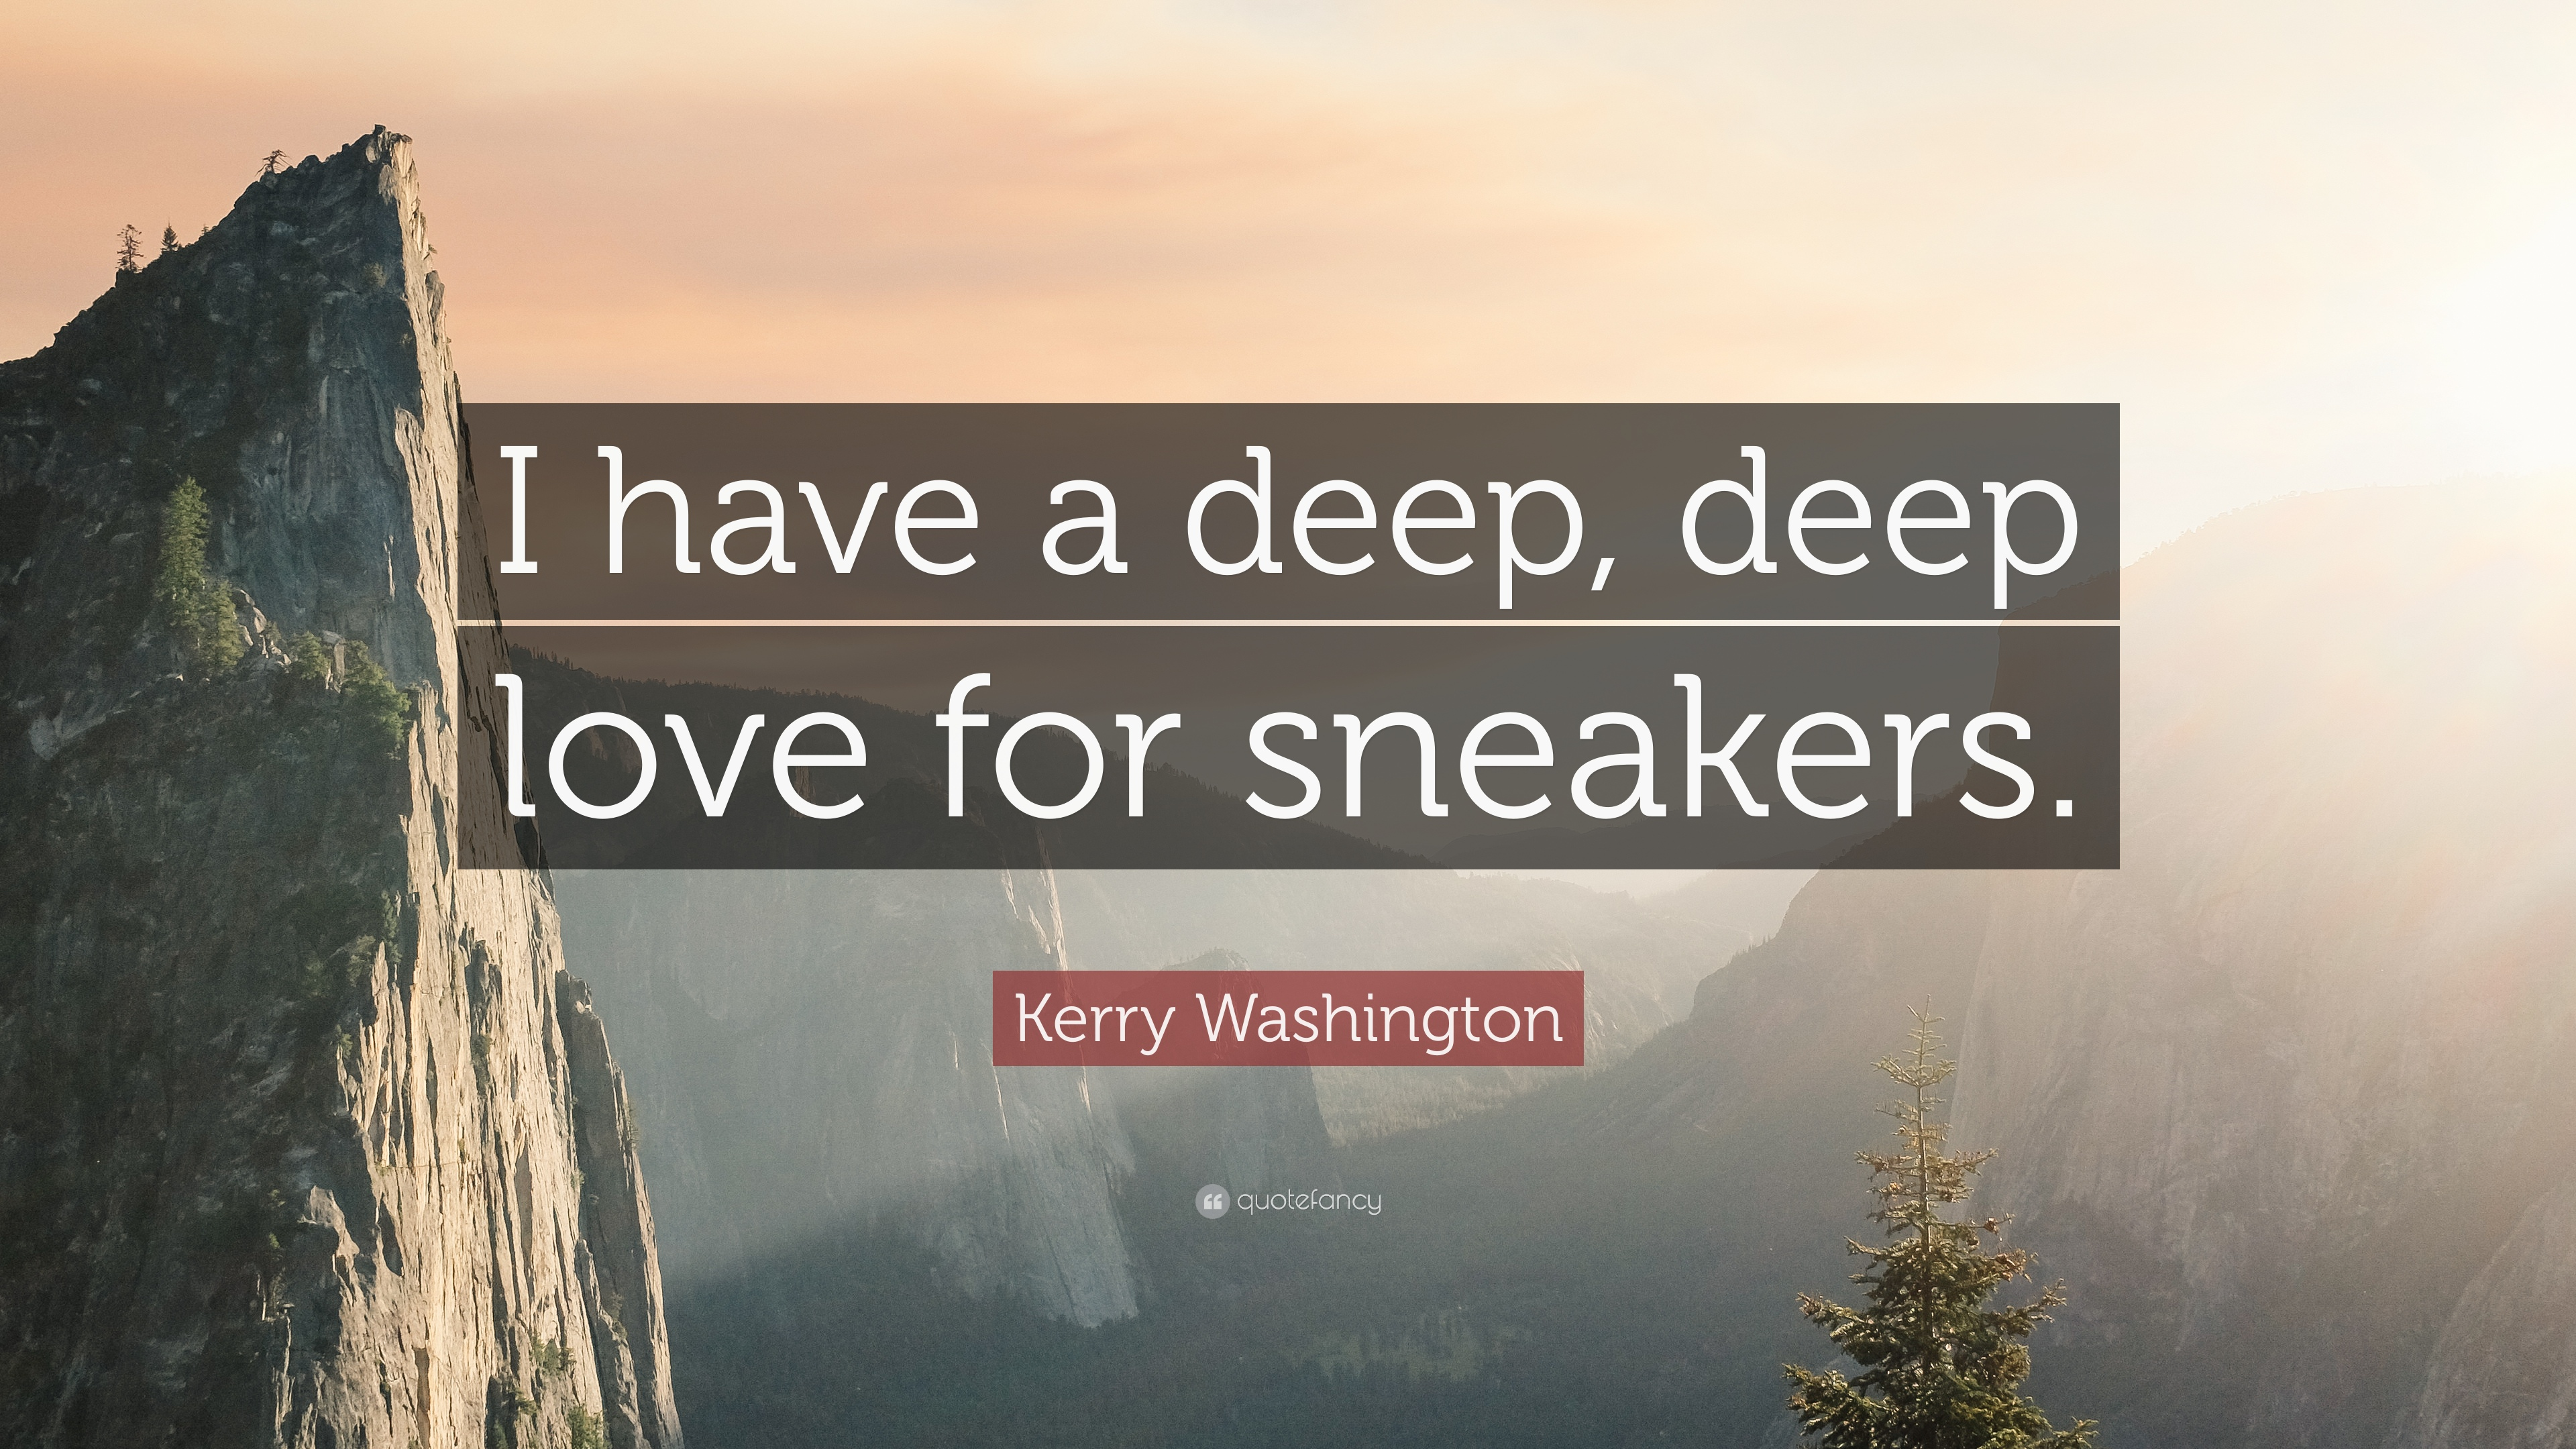 Kerry washington quote i have a deep deep love for sneakers 7 kerry washington quote i have a deep deep love for sneakers thecheapjerseys Image collections